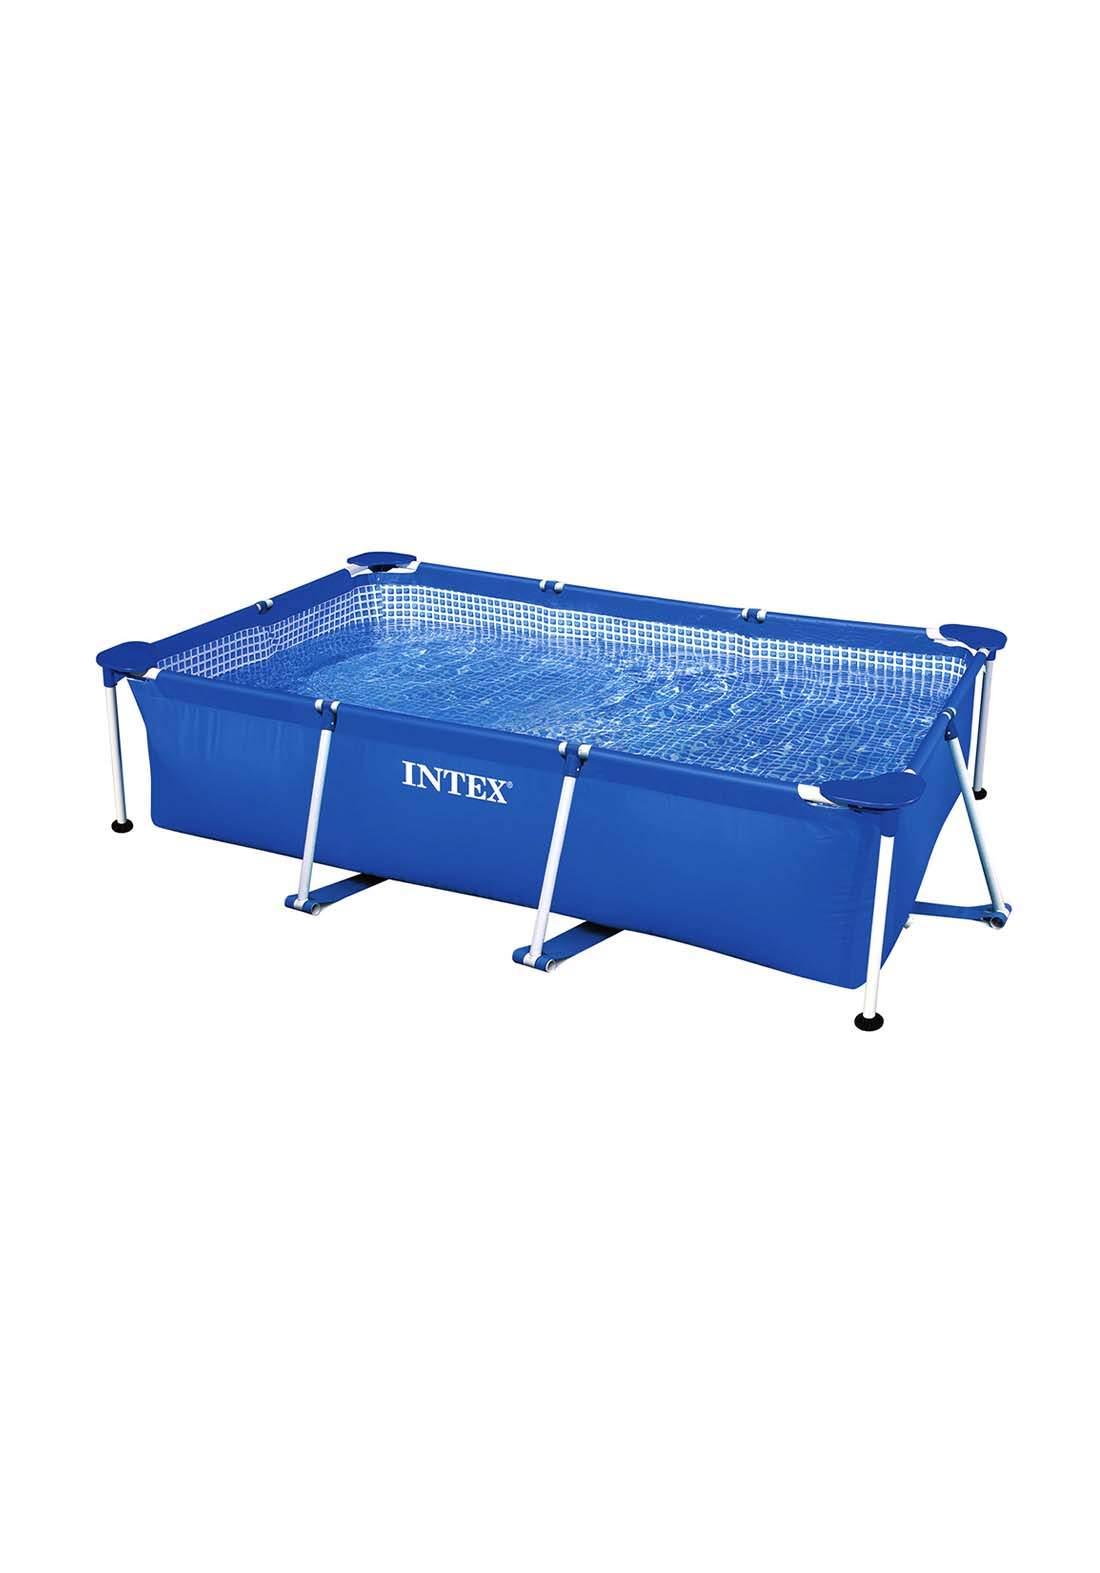 Intex 28272NP Small Frame Detachable Pool مسبح